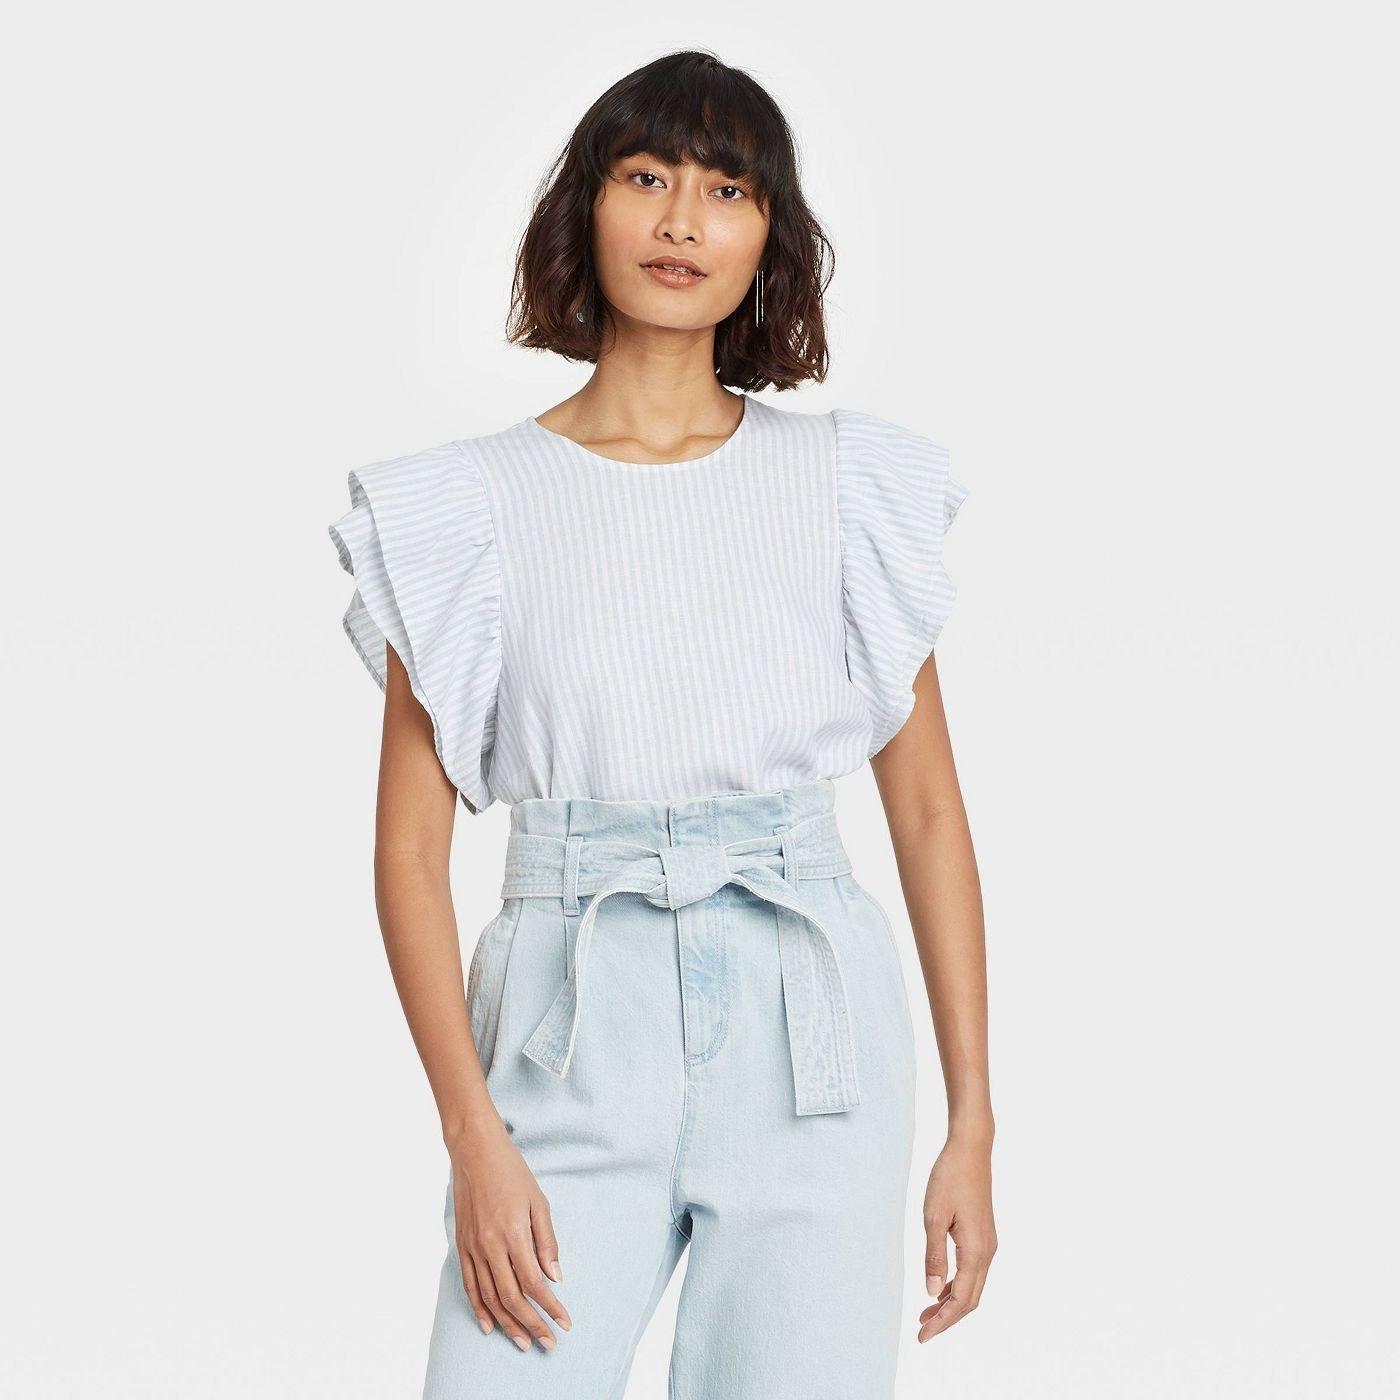 Model in ruffle short sleeve linen top